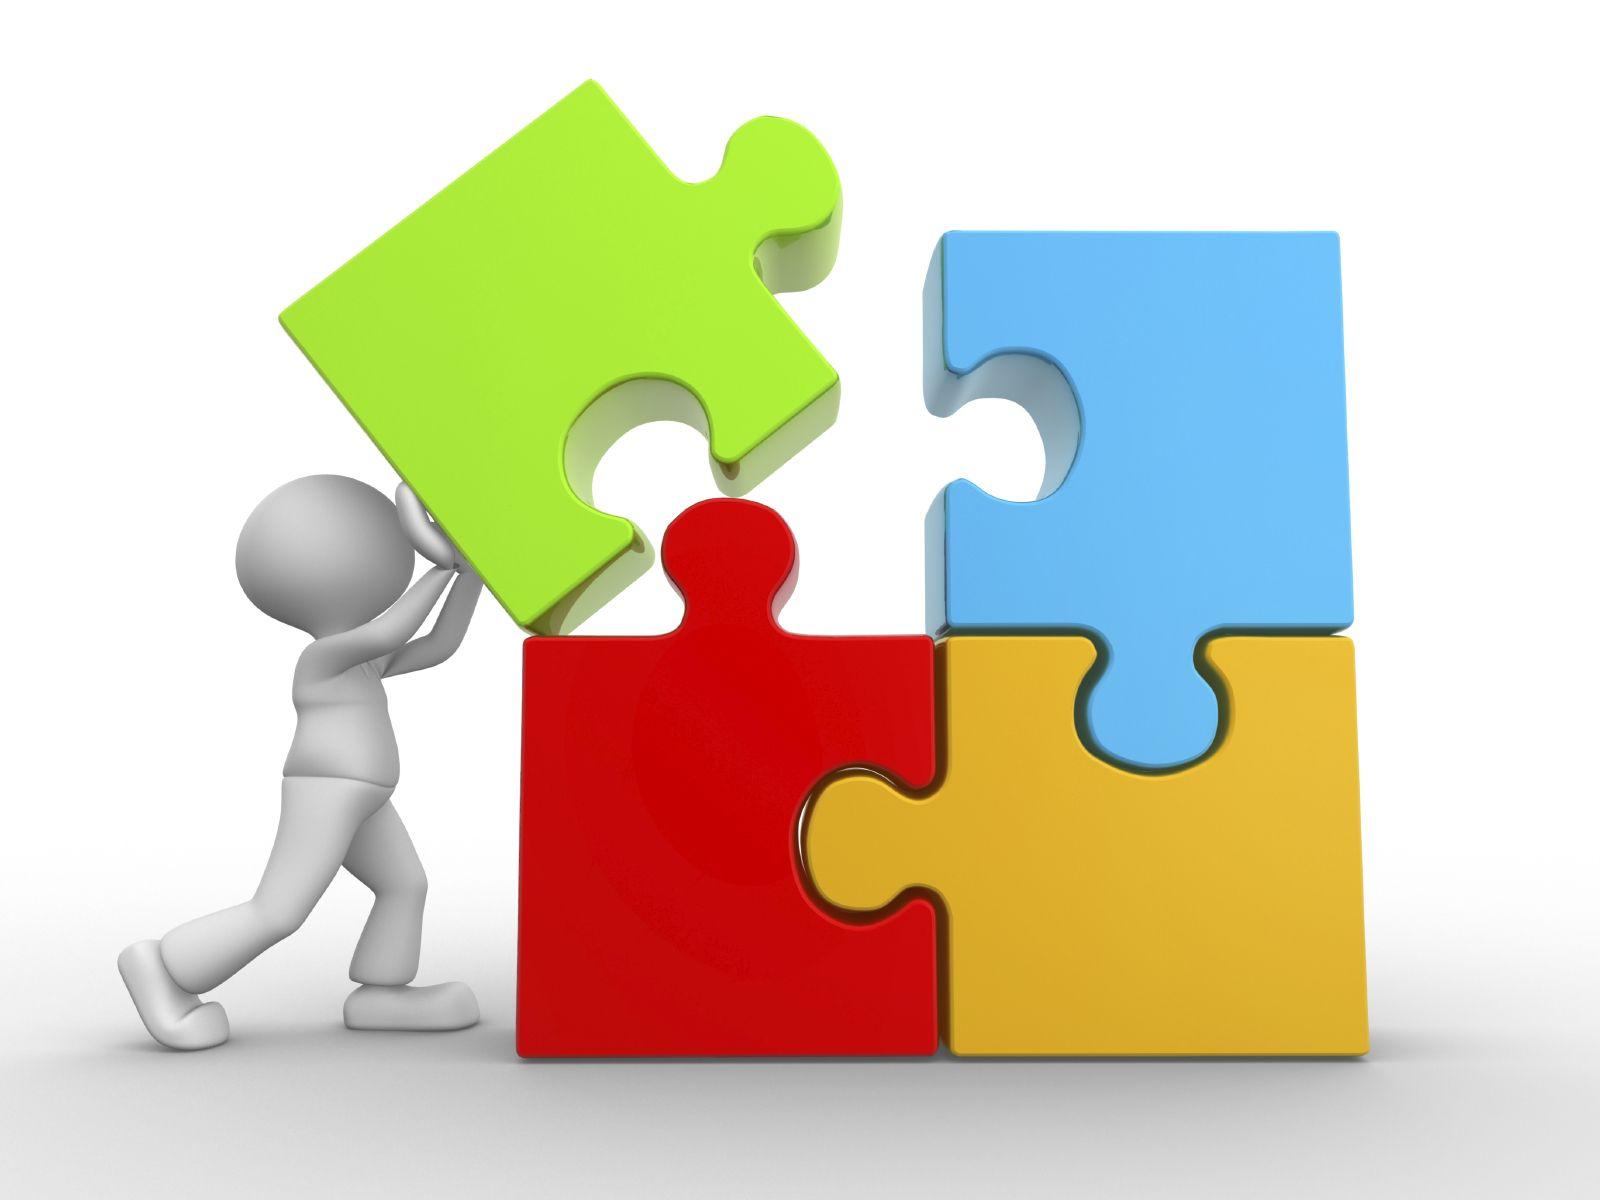 Puzzle clipart organization skills #4